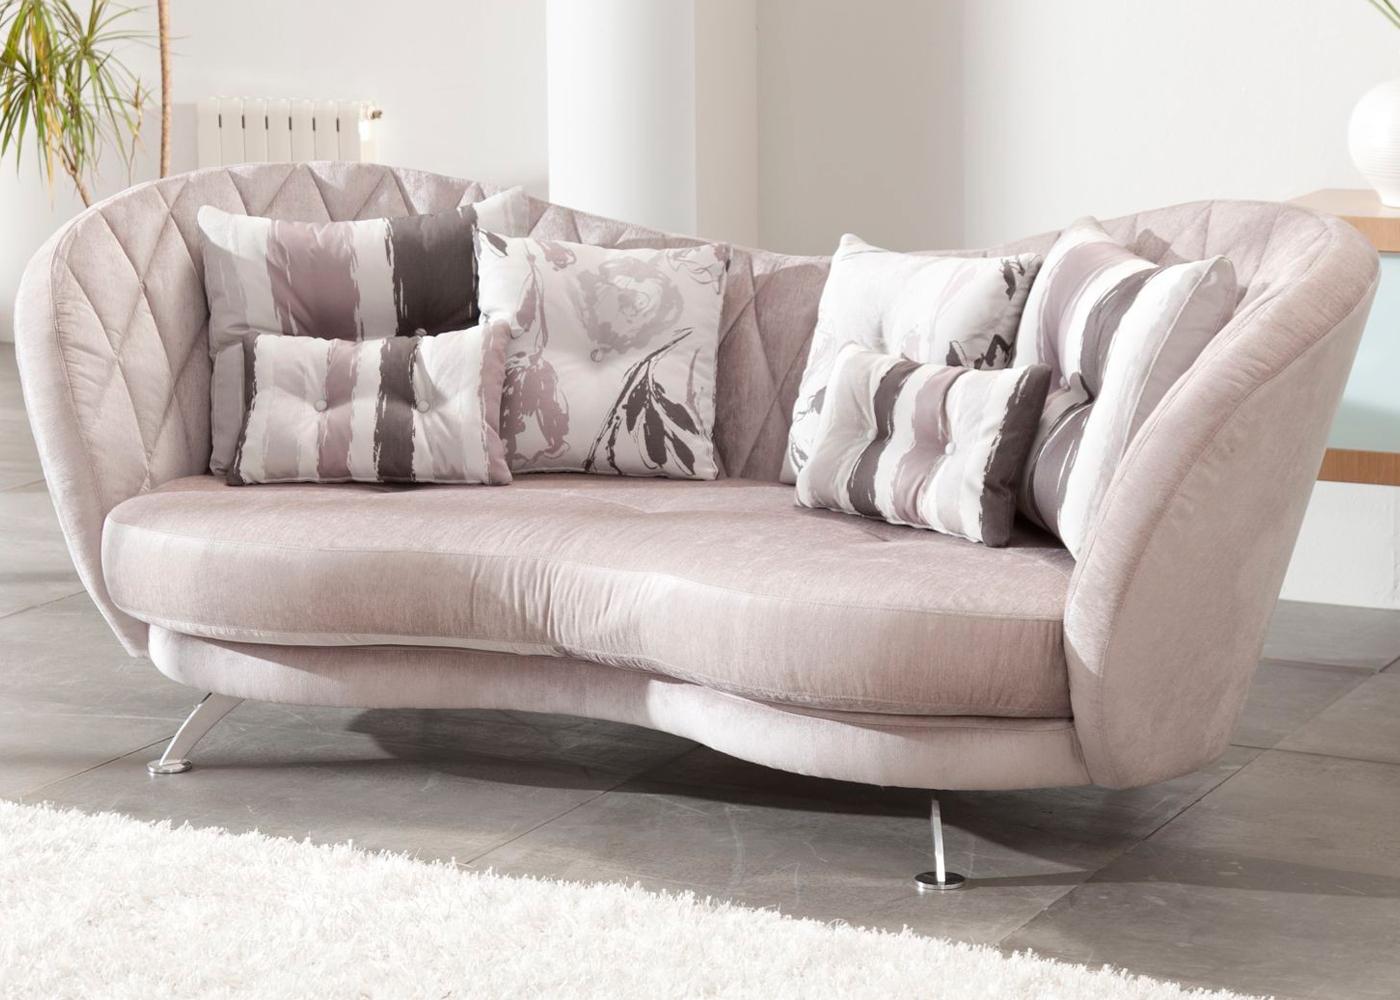 Fama Josephine 3 – Midfurn Furniture Superstore Inside Josephine Sofa Chairs (Image 2 of 25)